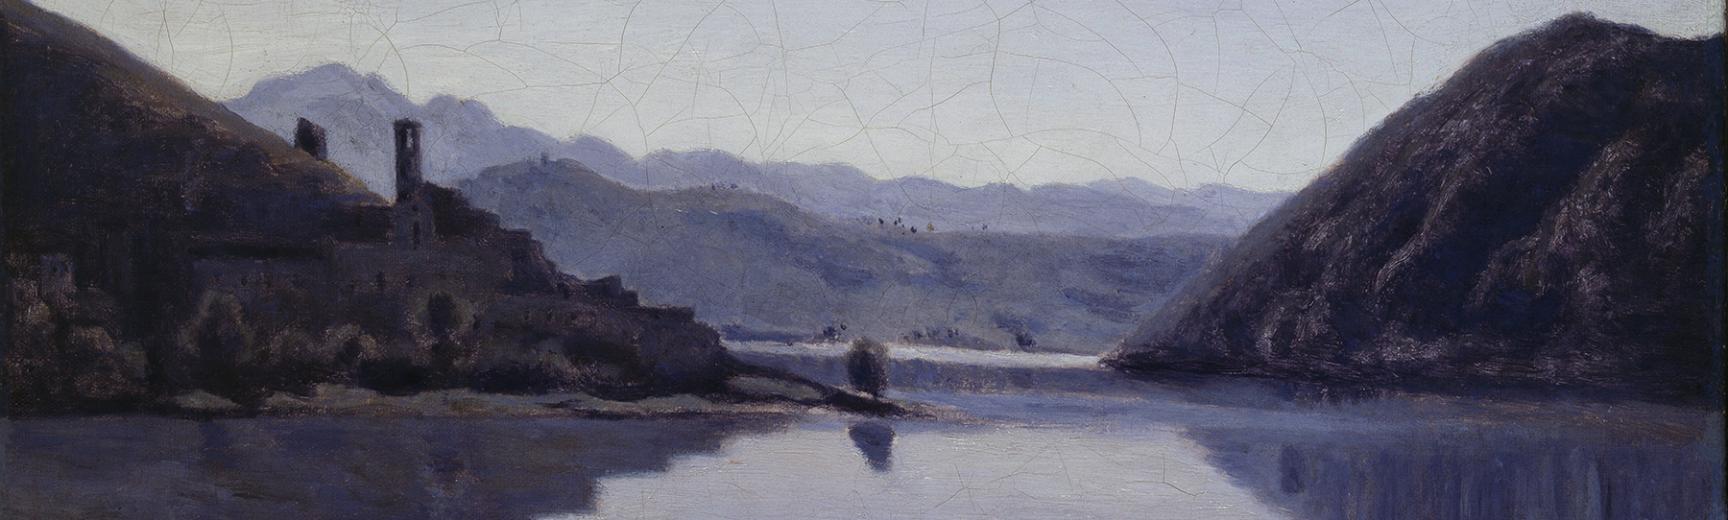 Lago di Piediluco, Umbria (detail) by Jean Baptiste-Camille Corot (1796-1875)